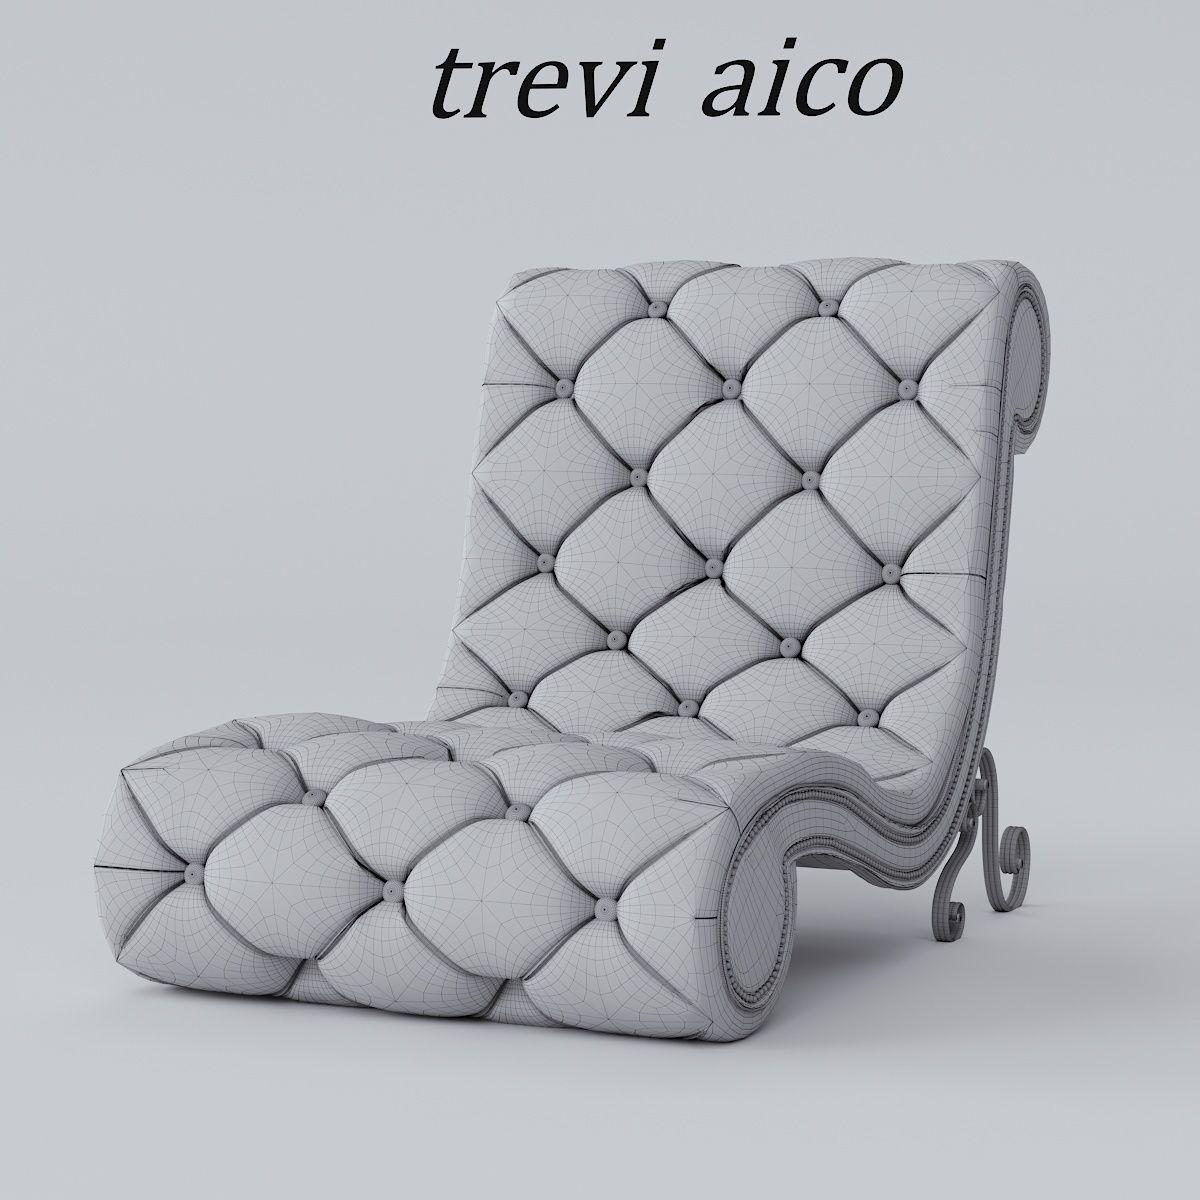 ... Armchair Chaise Lounge Trevi Aico 3d Model Max Obj Mtl Fbx Stl 4